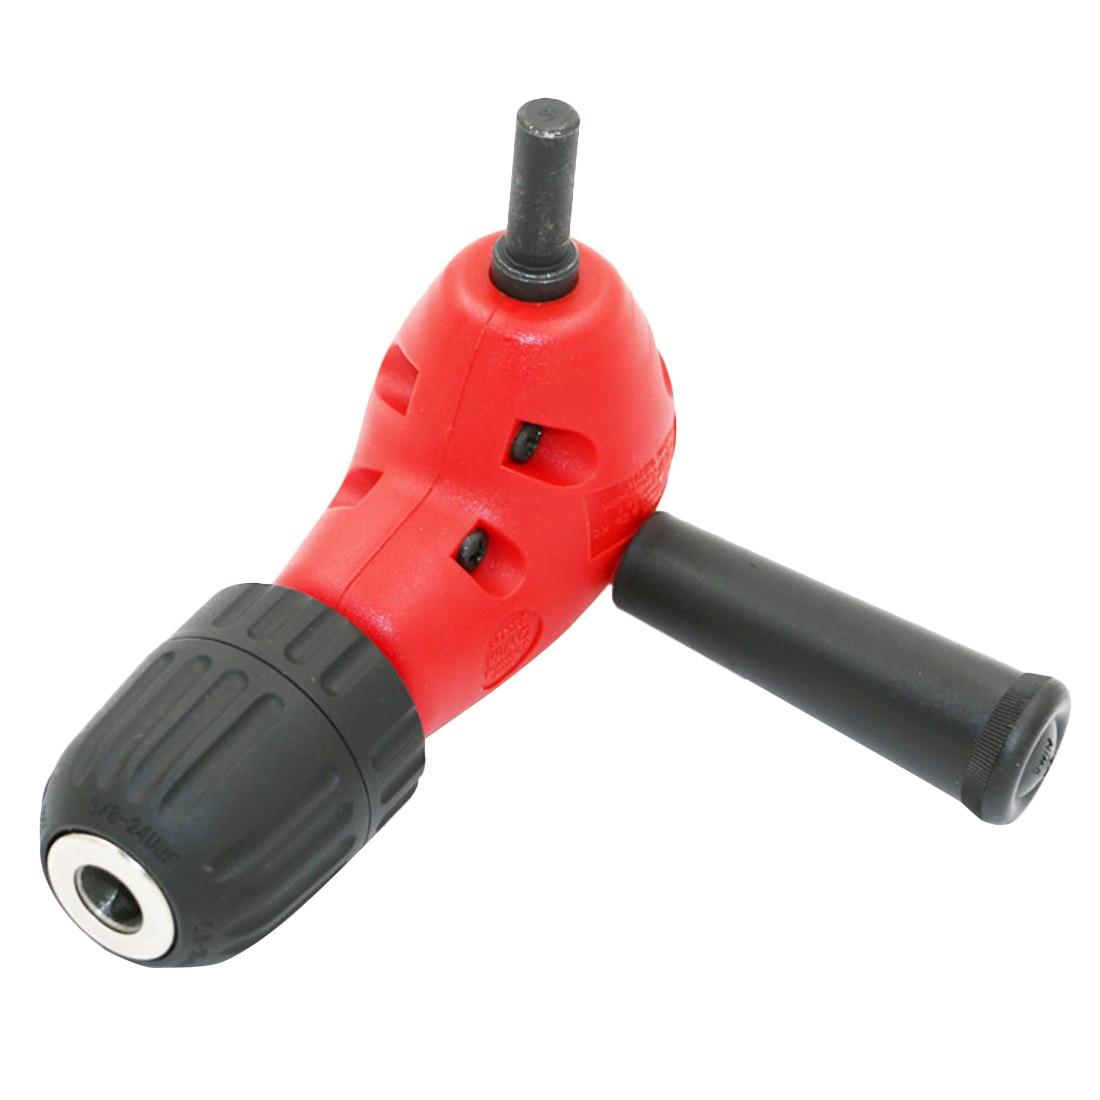 90 Degree Angled Drill Chuck Universal Drill Bit For Metal Adapter Screwdriver Corner Easily Locks